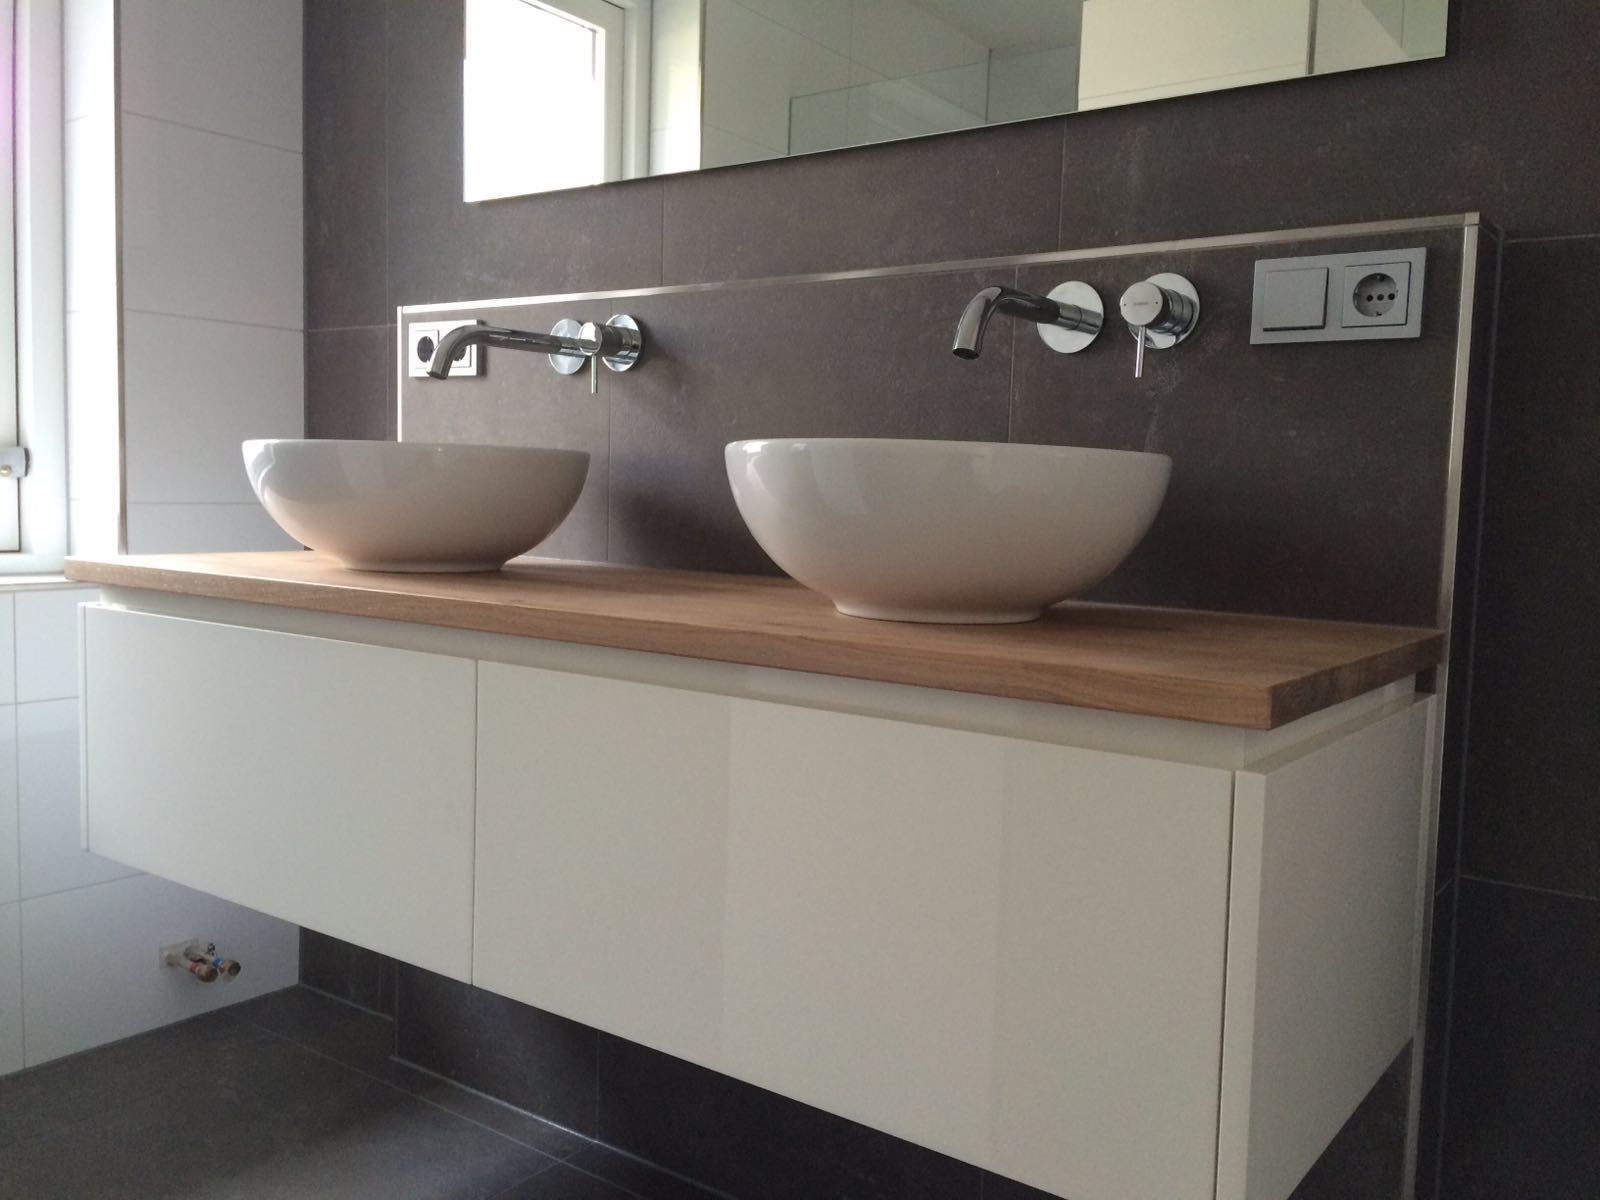 badkamermeubel met eiken blad pj van der vegt